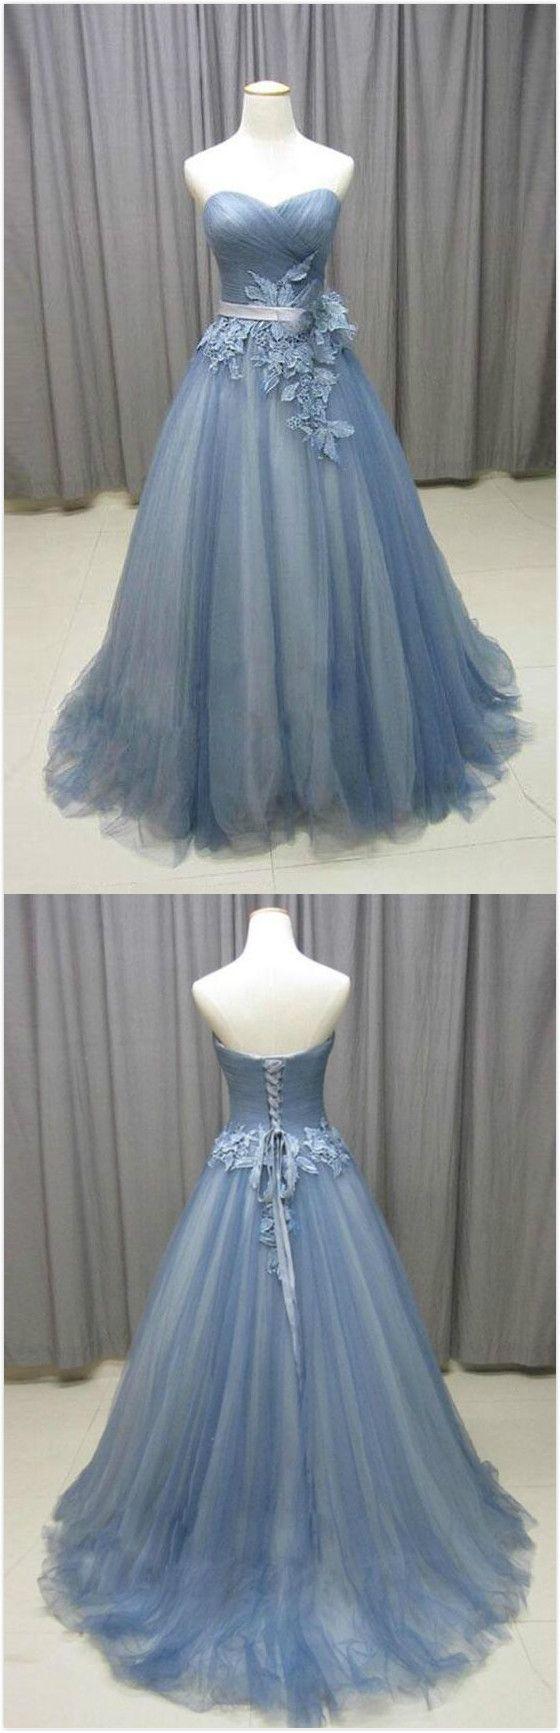 Gray blue prom dresstulle prom dresssimple aline prom dresscheap